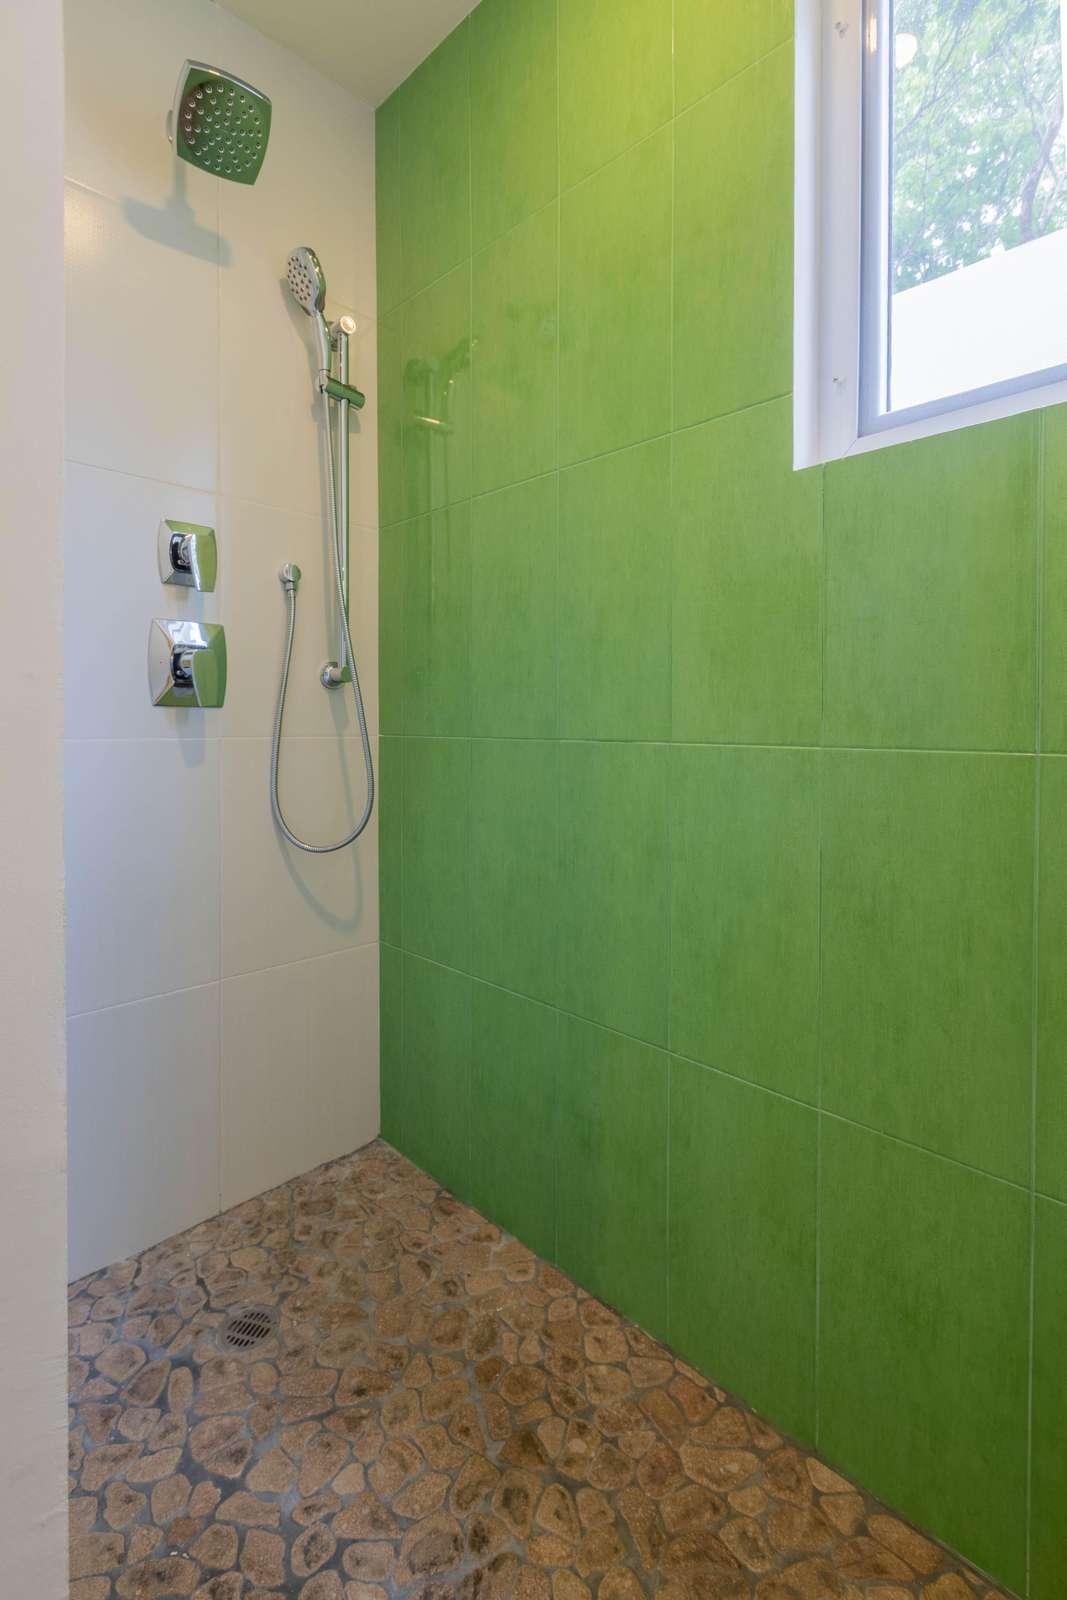 Bathroom 1 His/Her Shower